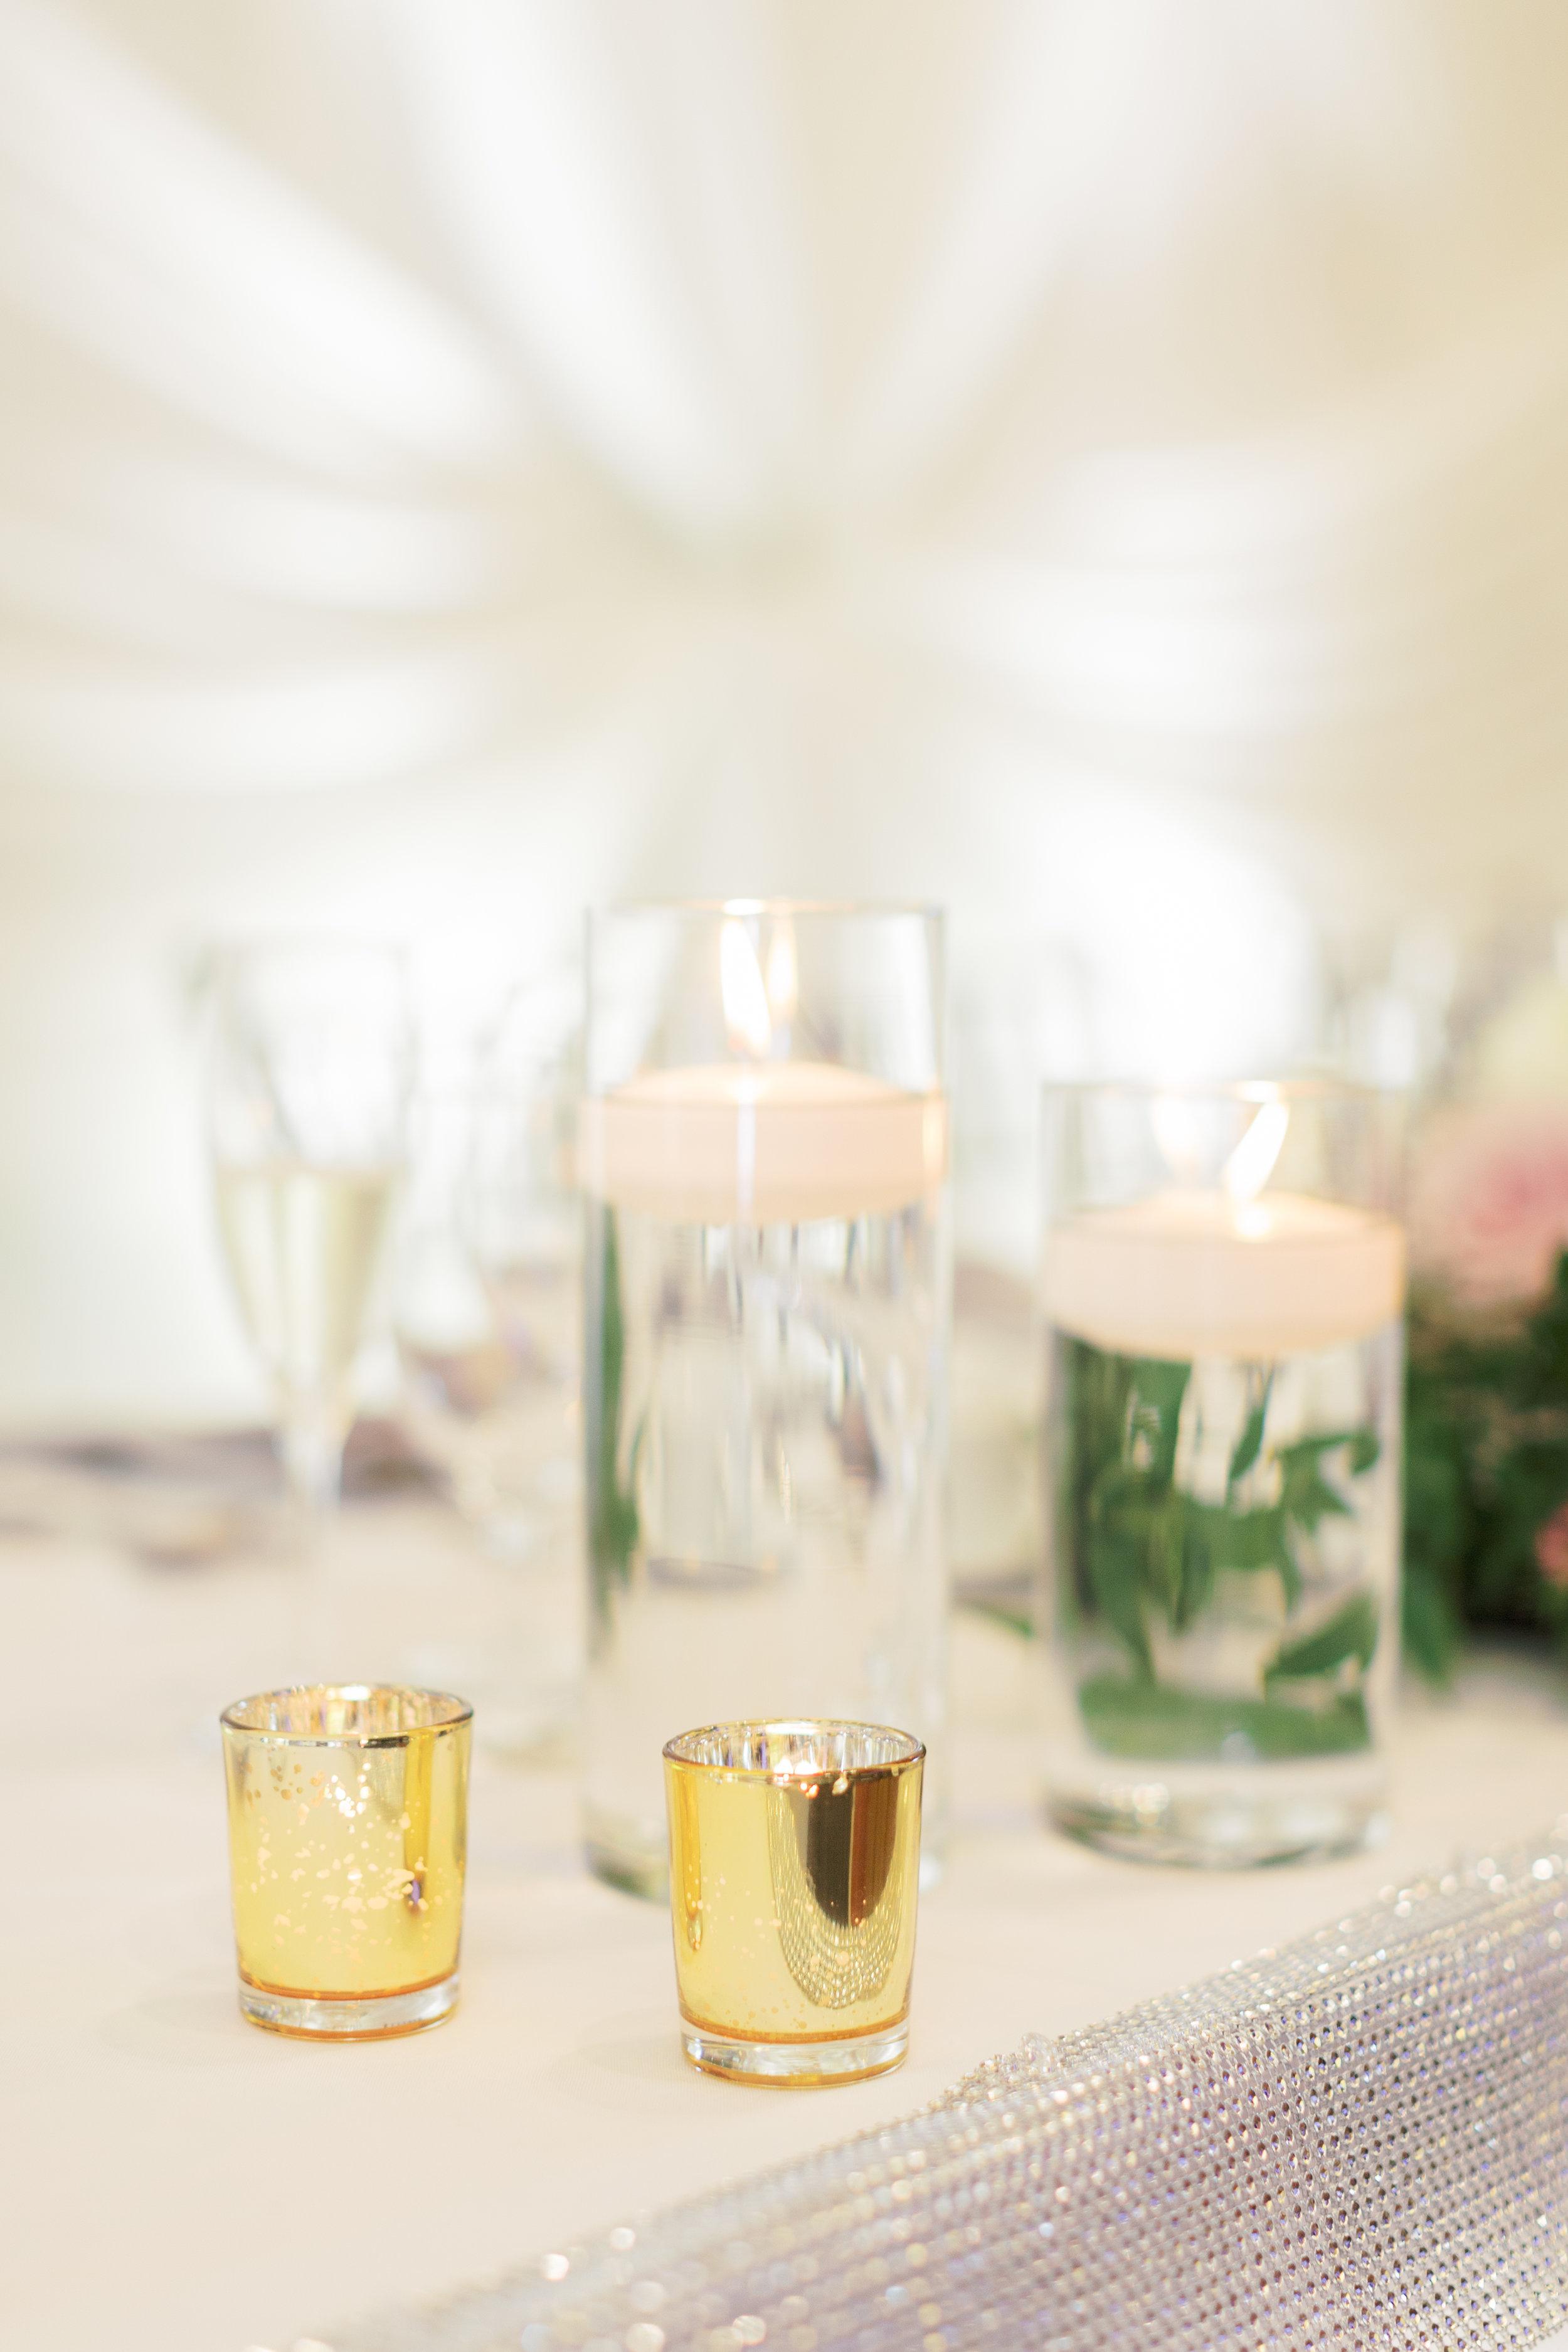 Angus Glen Wedding - Cocktails and Reception-19.jpg